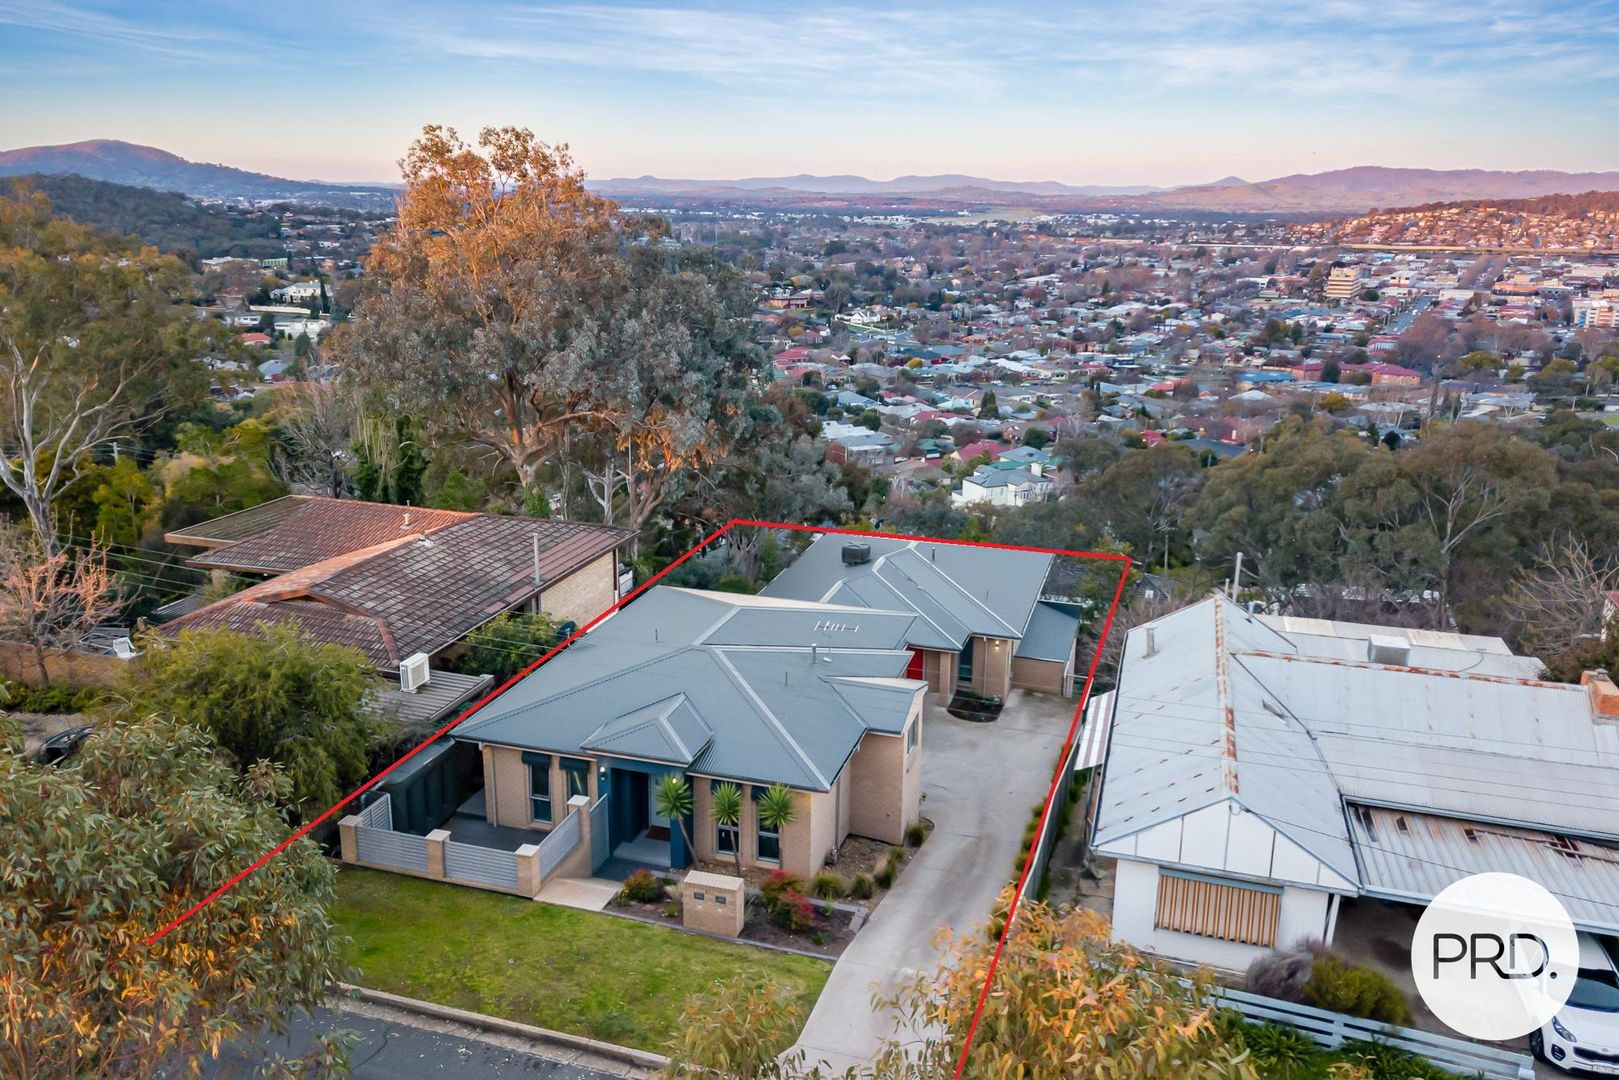 2/536 Roper Street, Albury NSW 2640, Image 0